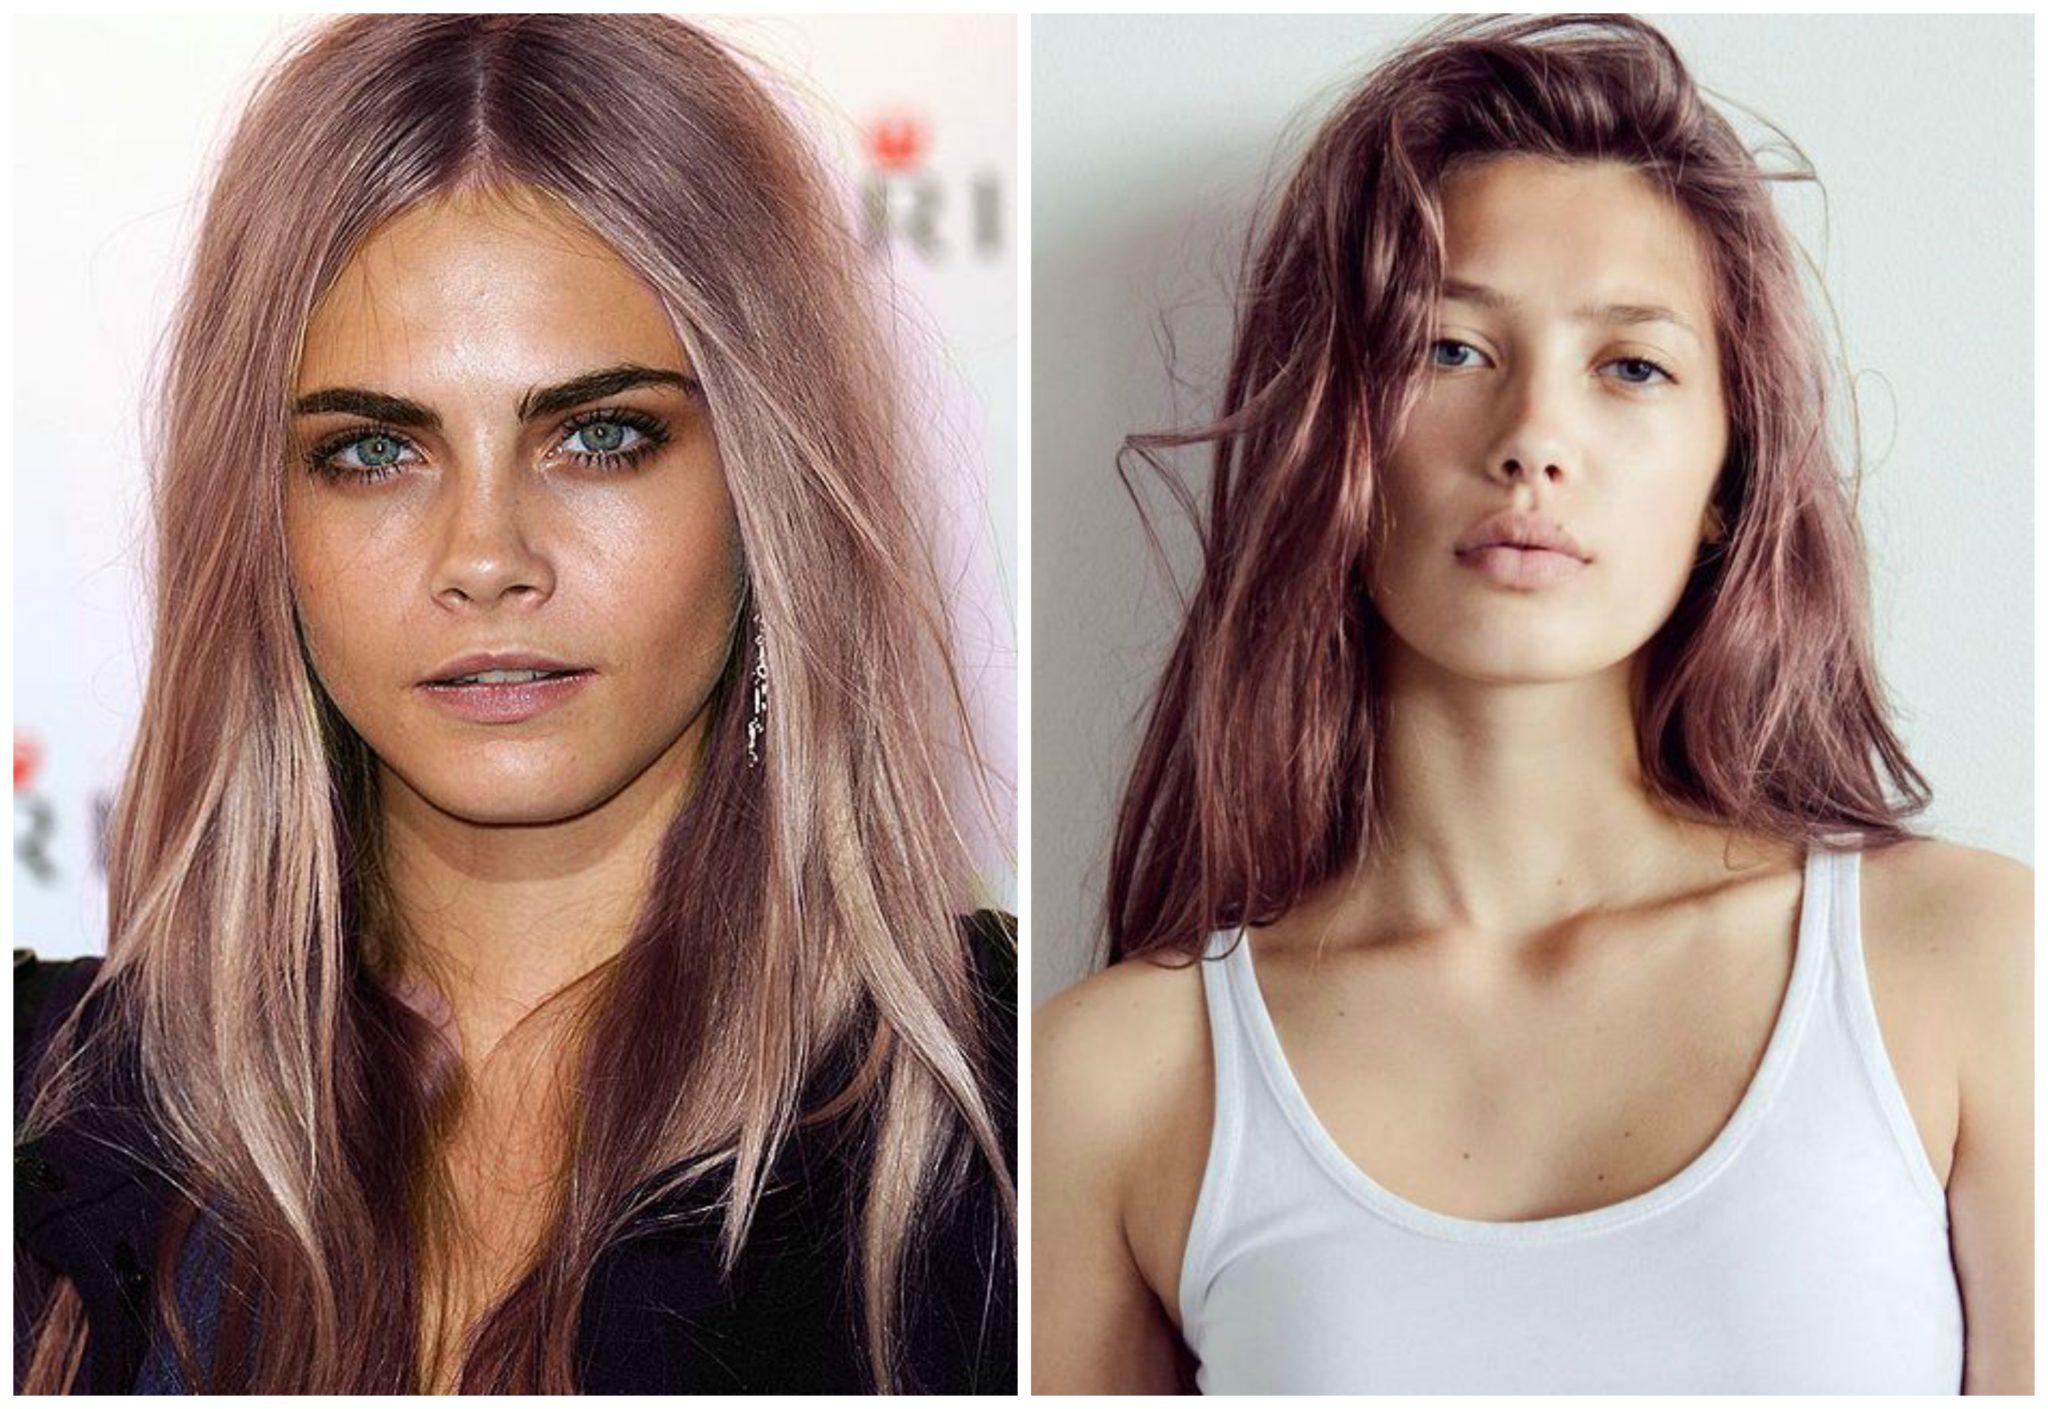 hårtrender 2016 höst